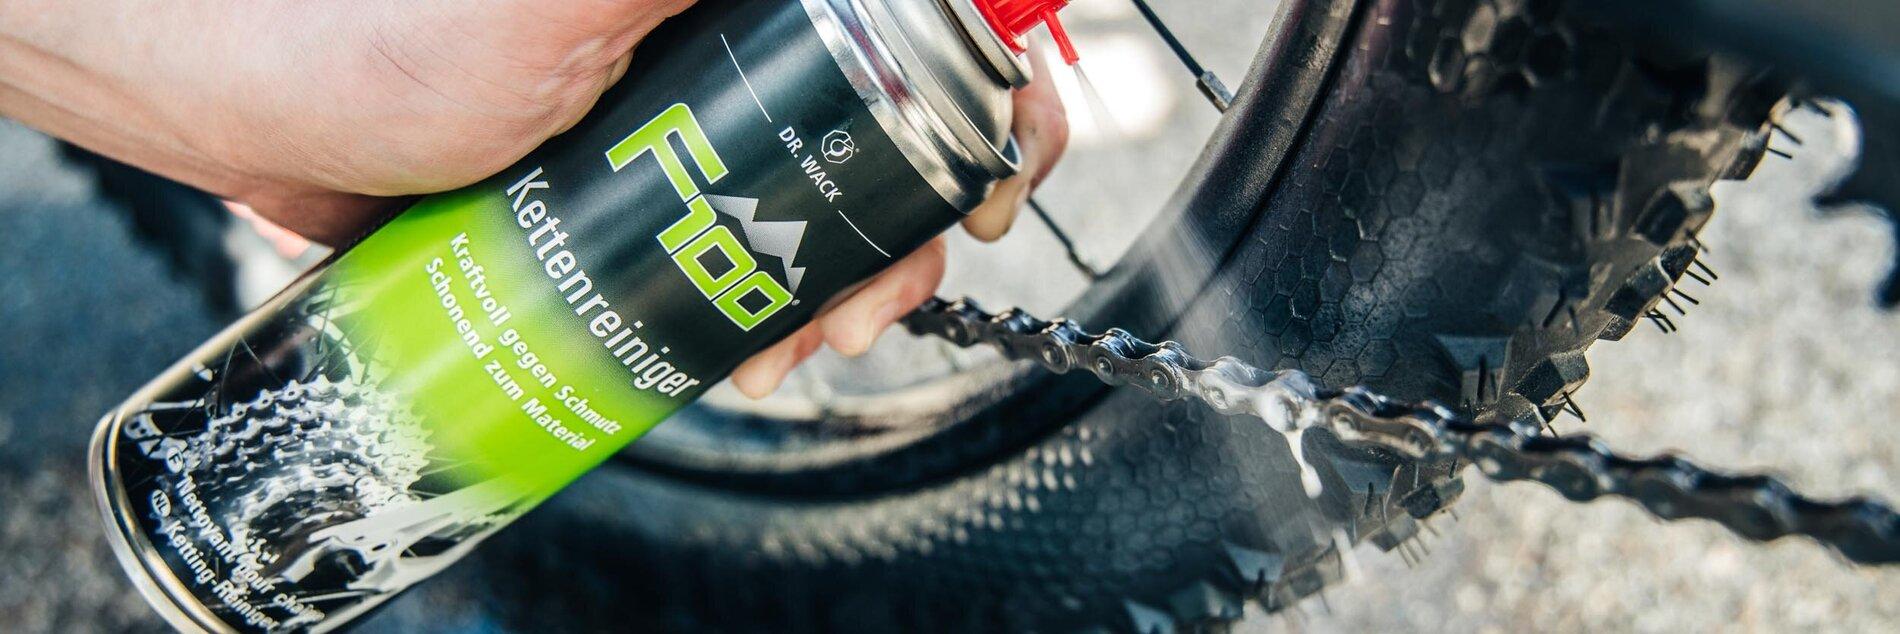 Reinigung WOVELOT Kettenreiniger Fahrradpflege